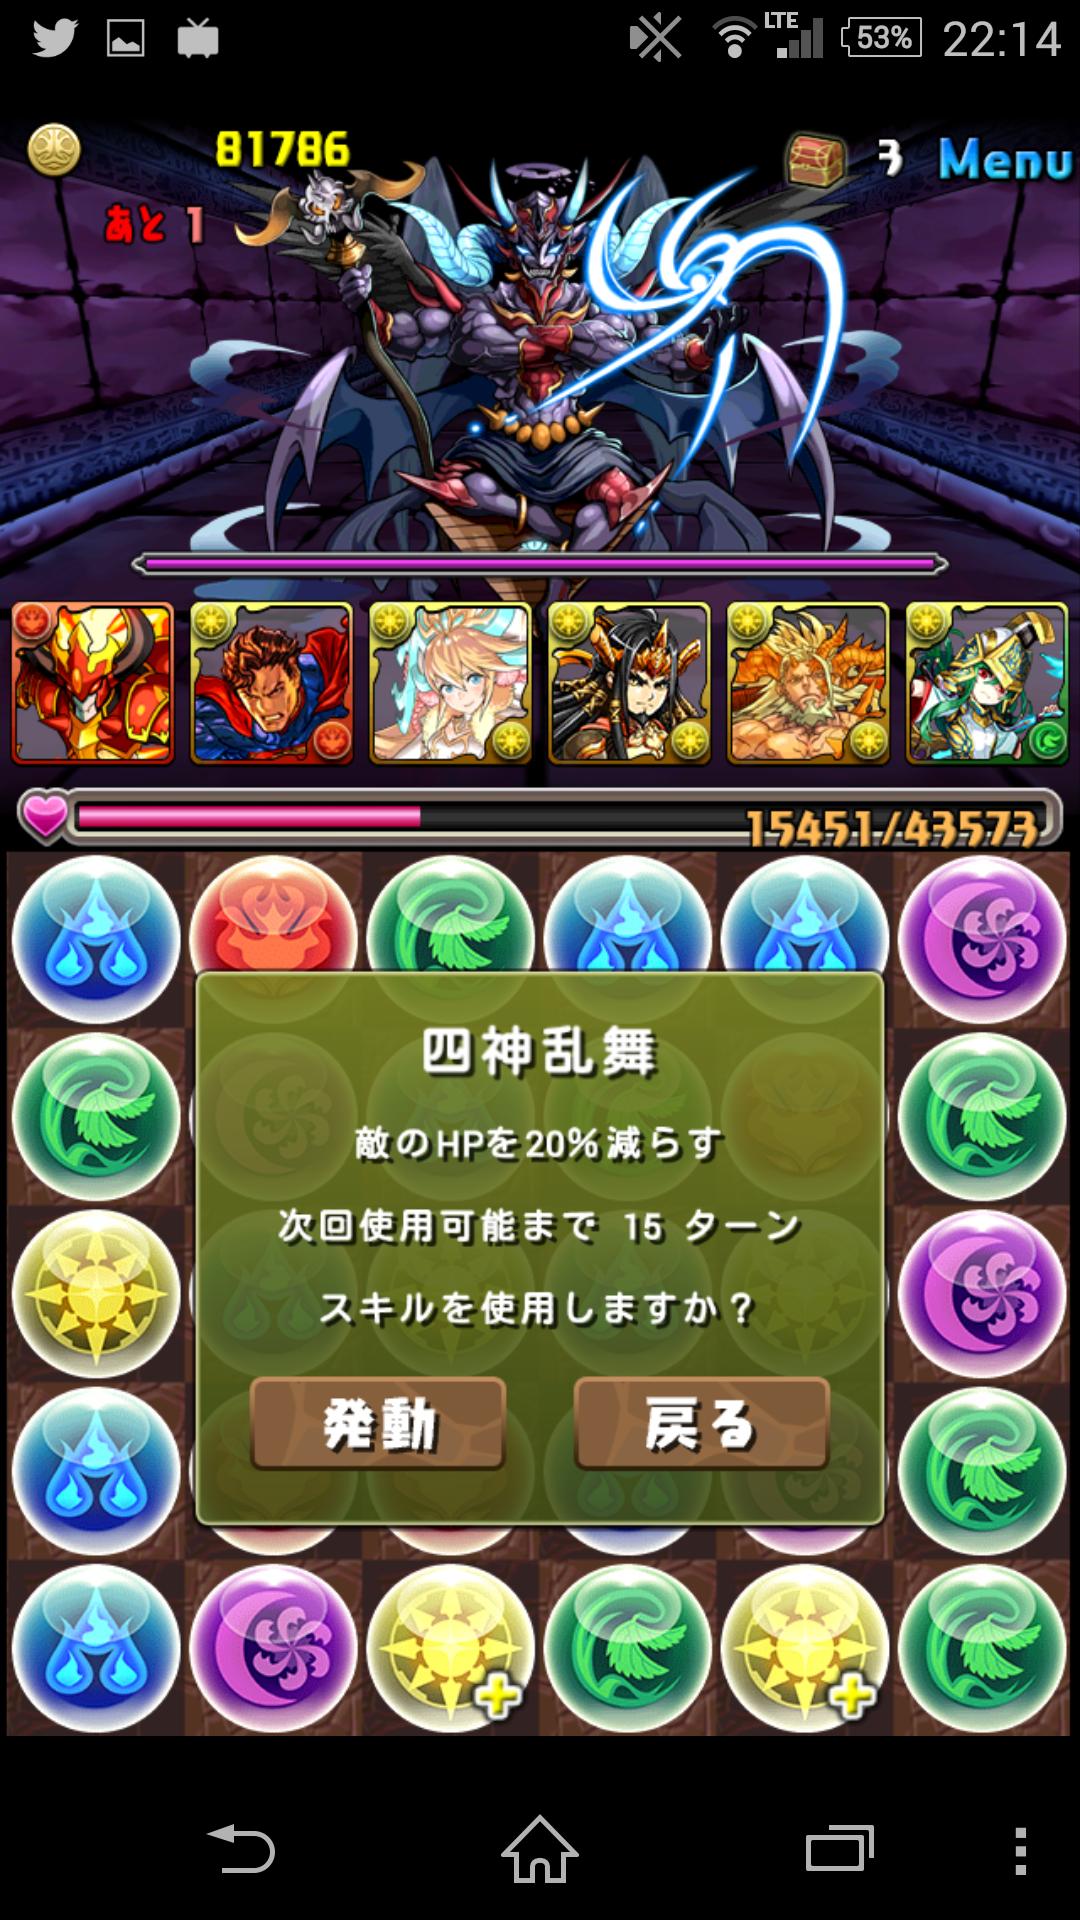 Screenshot_2015-01-24-22-14-41.png